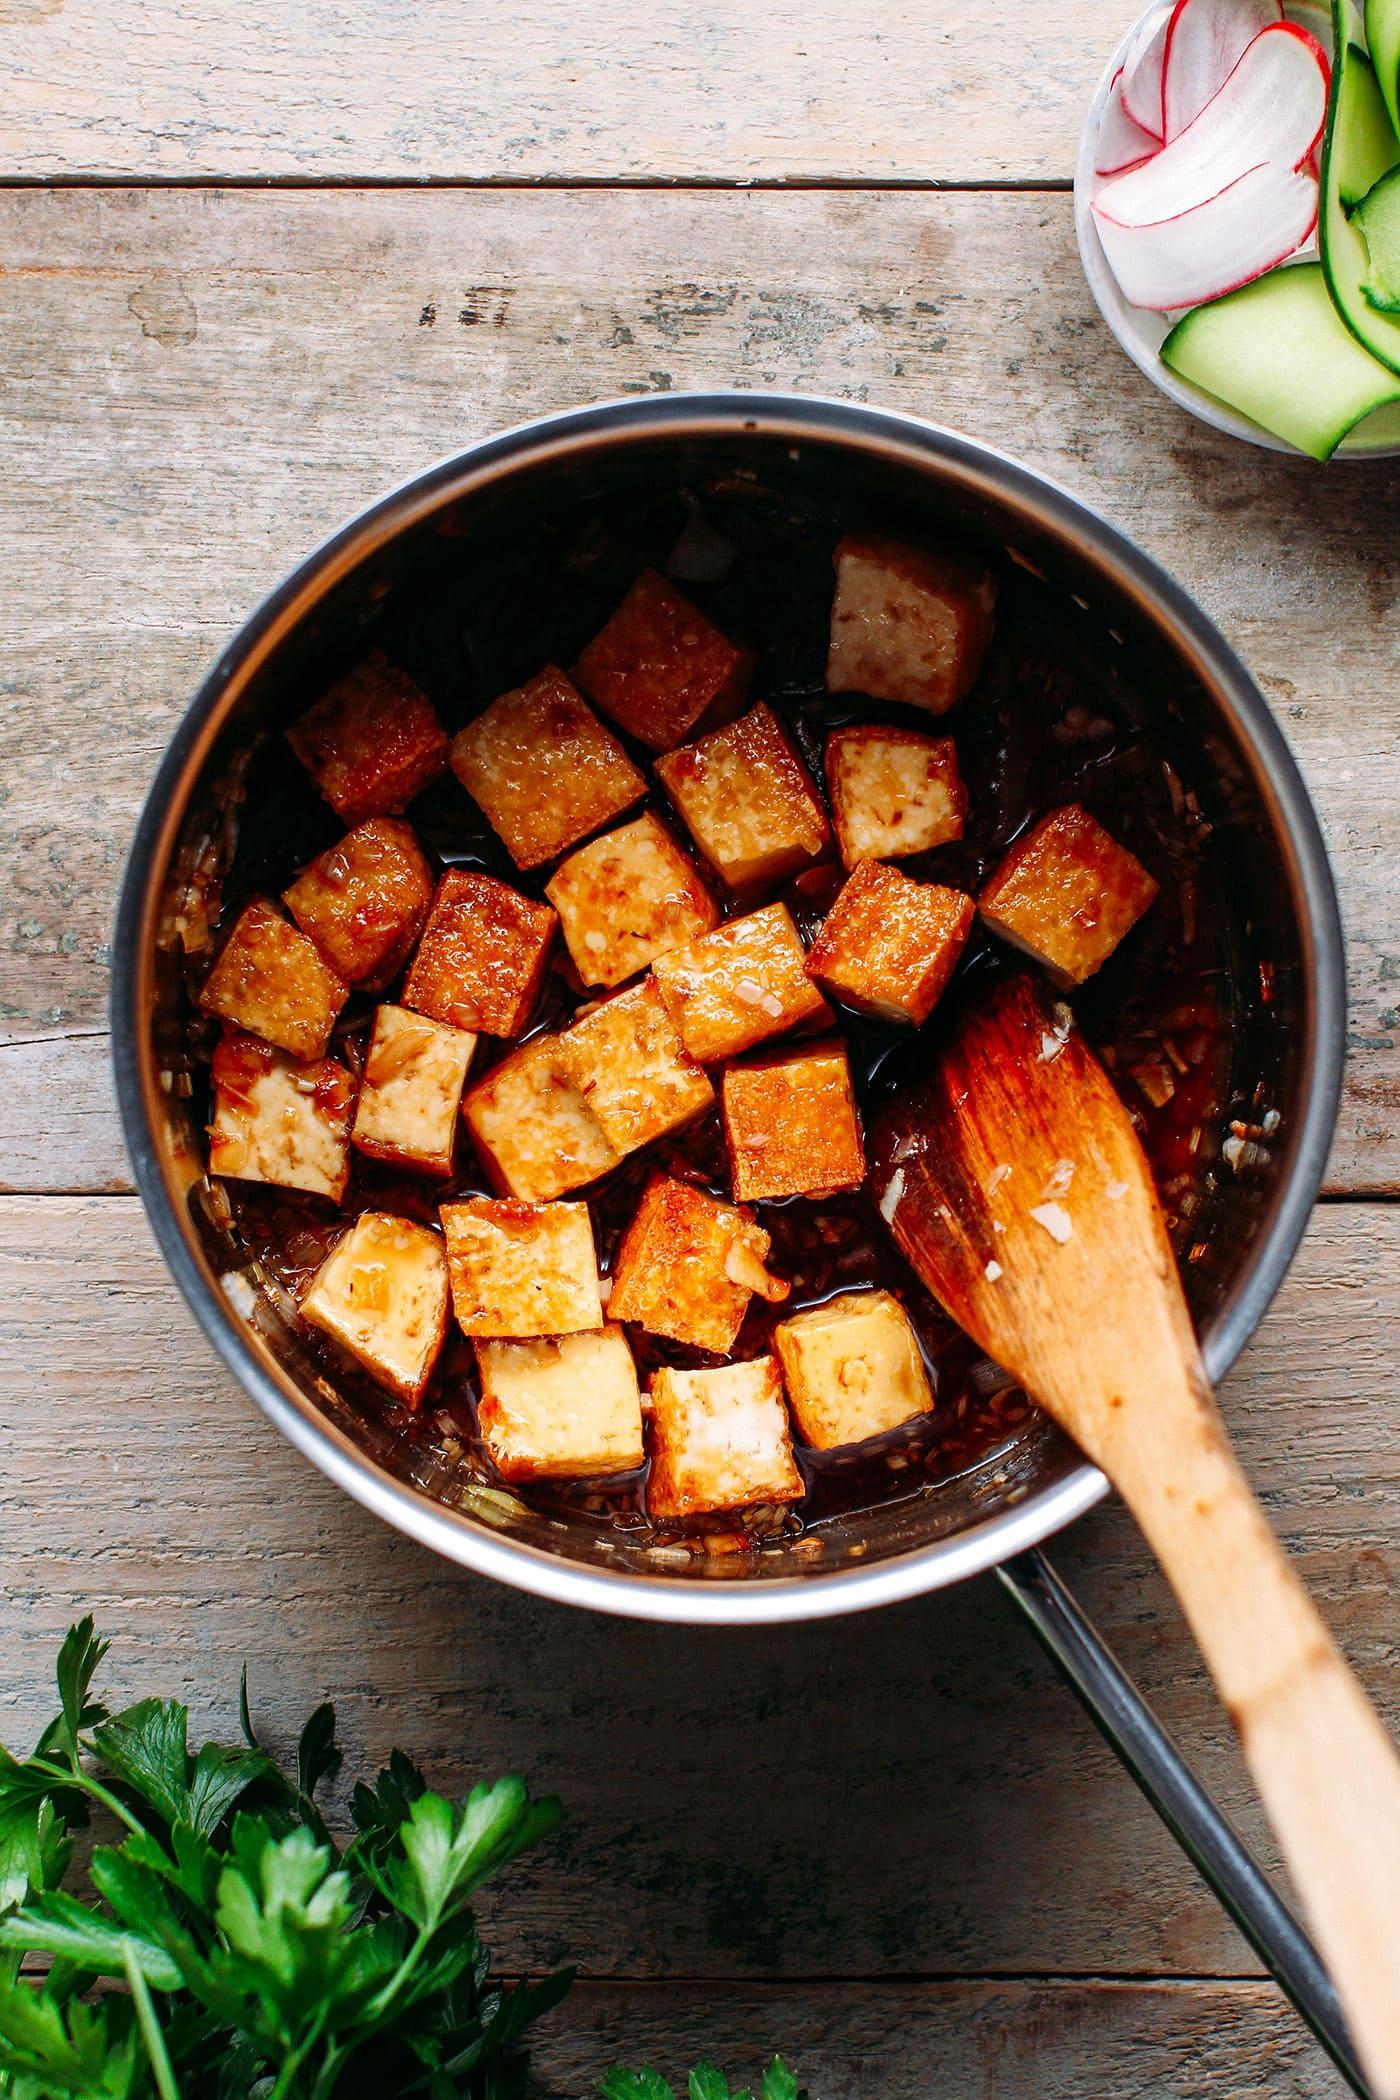 Saucy Caramelized Tofu Bowls